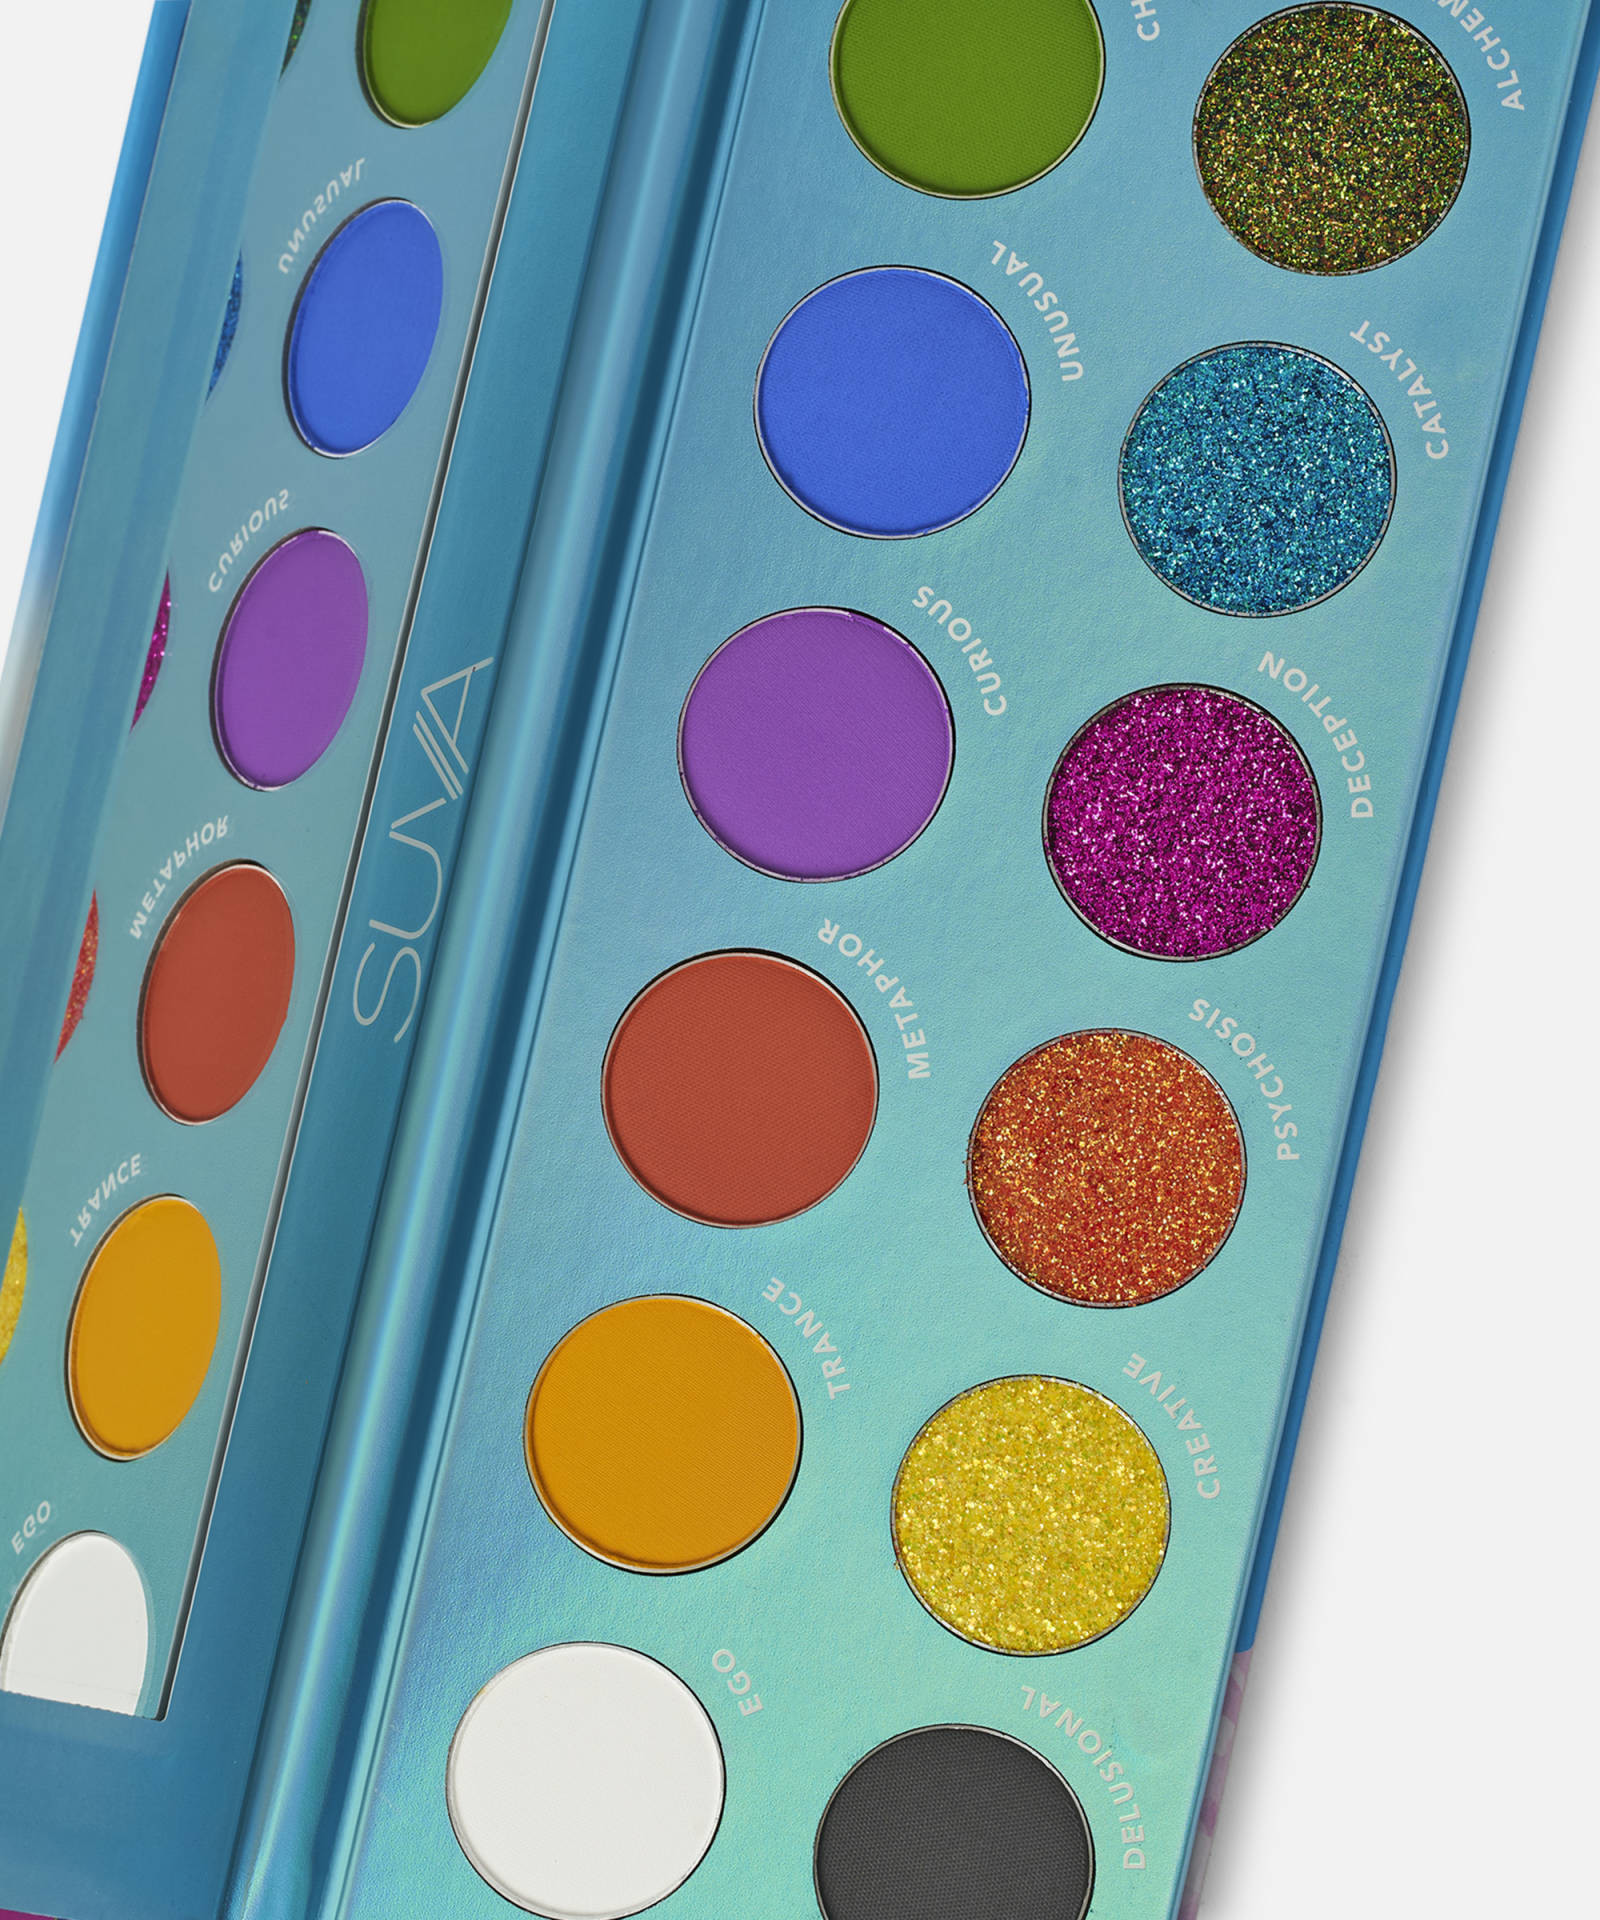 Suva Beauty Magic + Ecstasy Palette